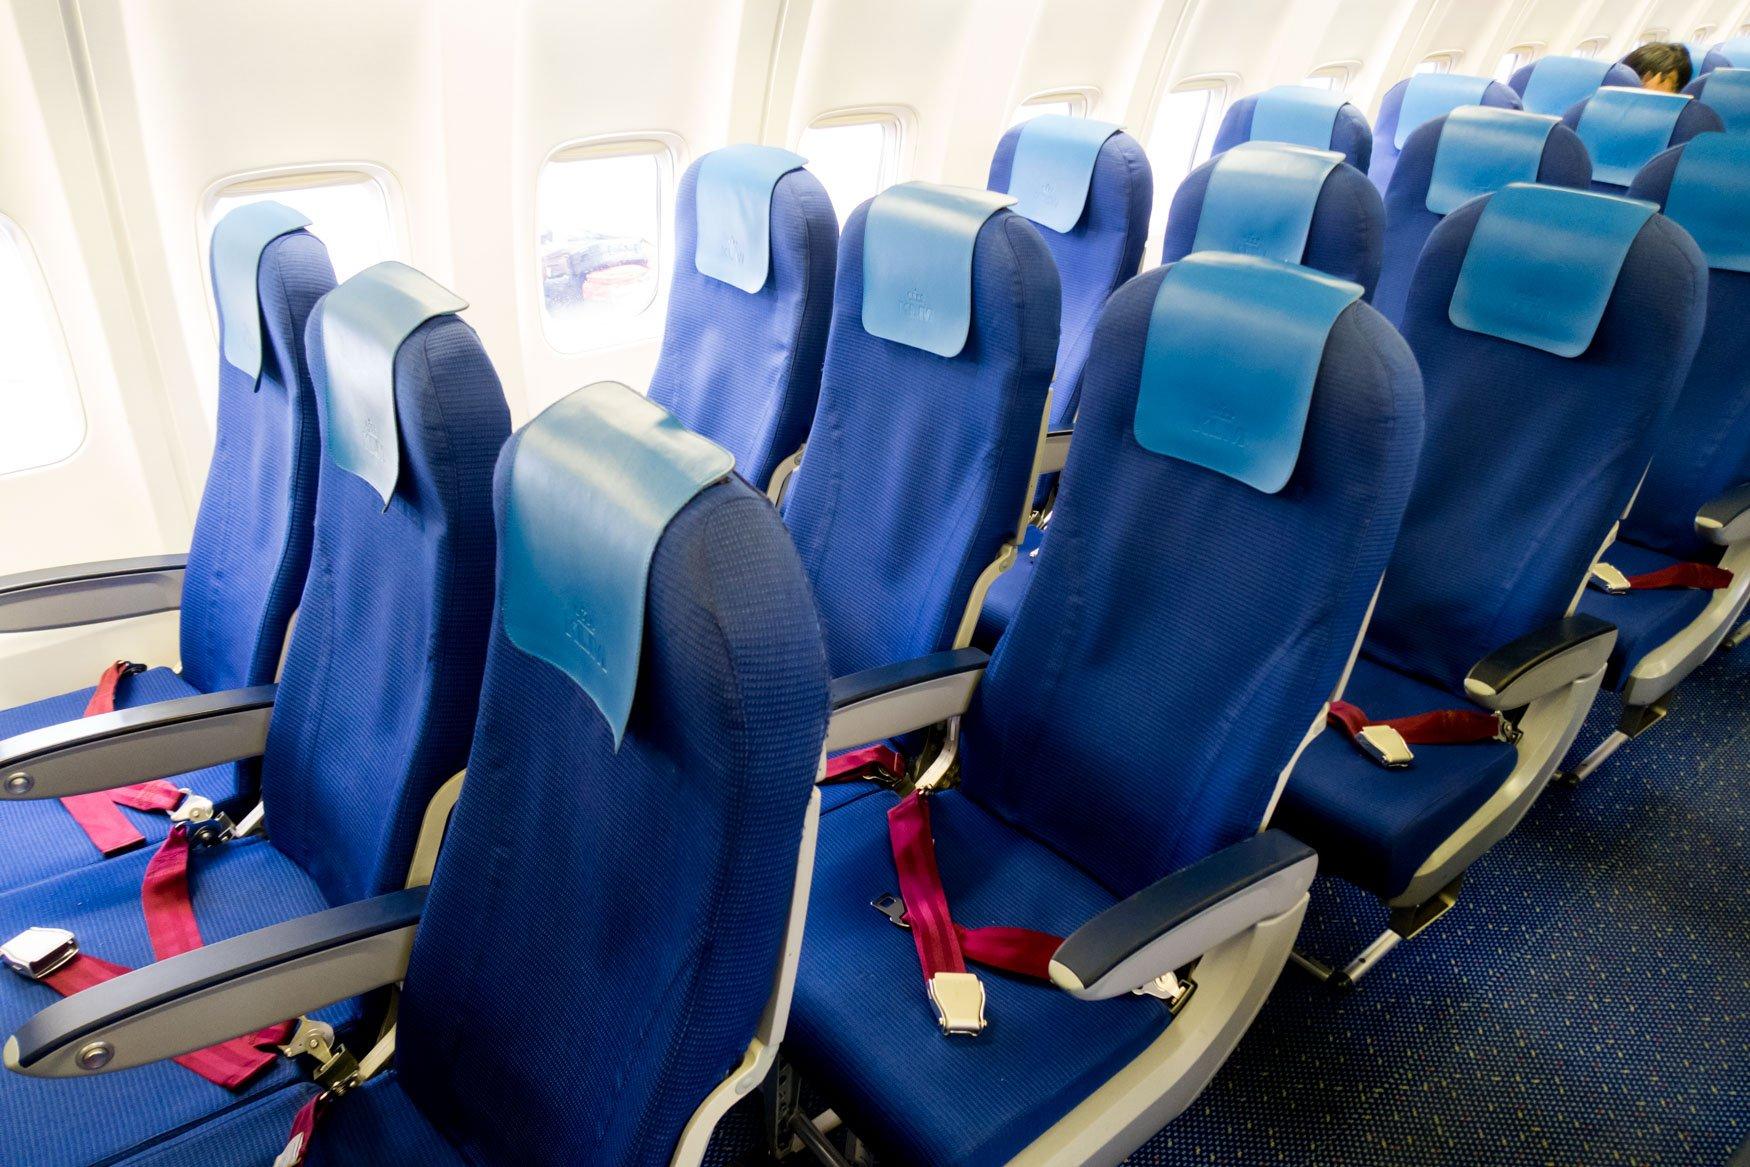 KLM Intra-European Economy Class Seats